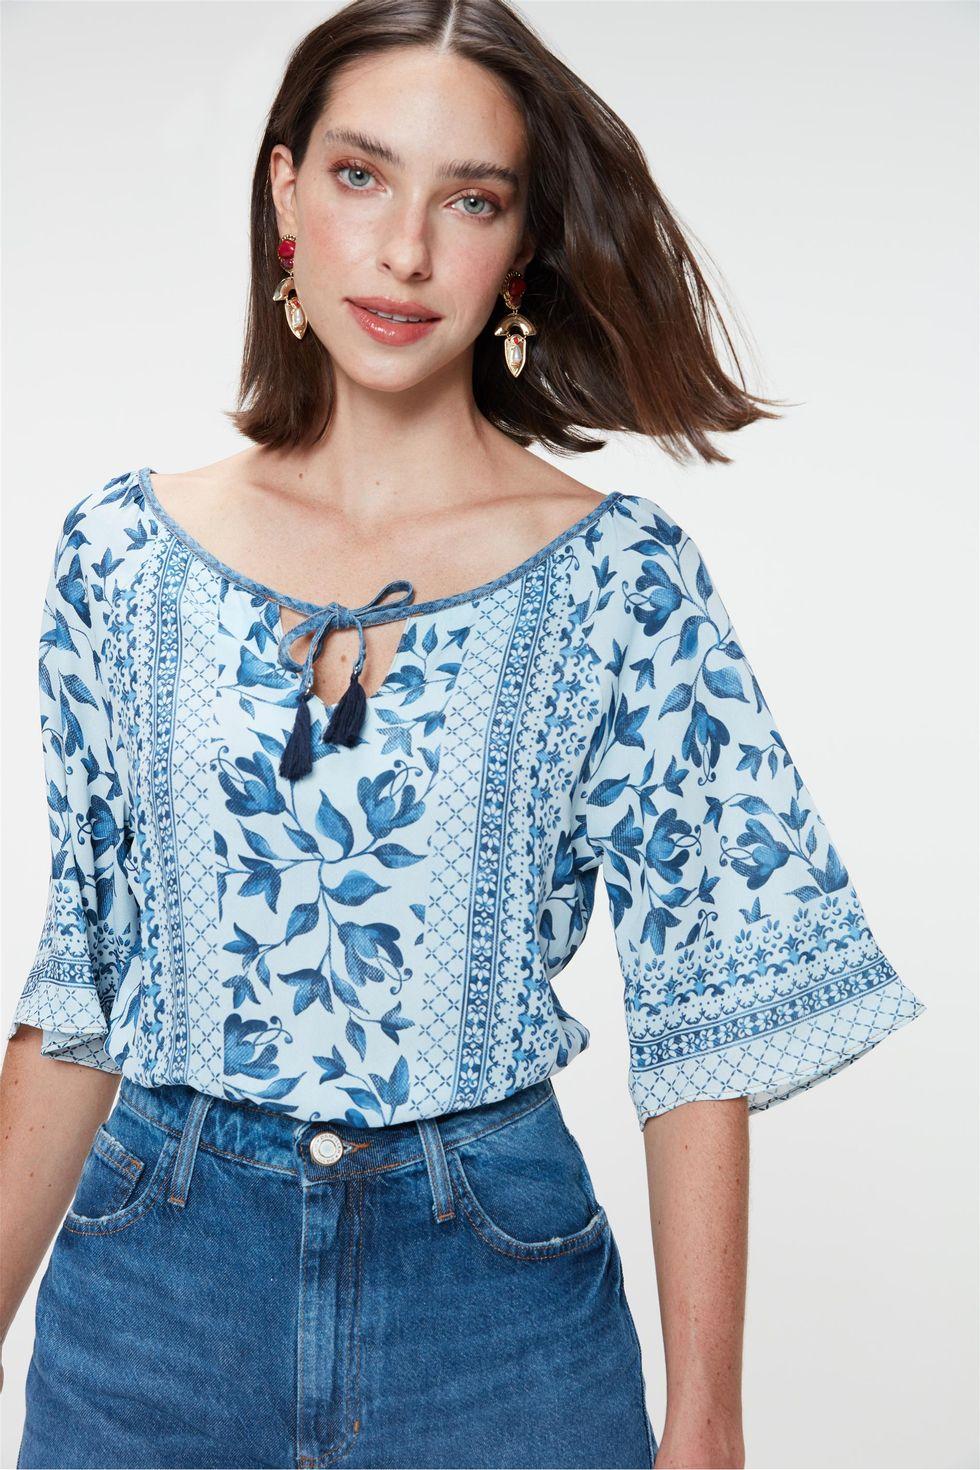 Blusa-Cropped-Jeans-com-Estampa-Floral-Frente--